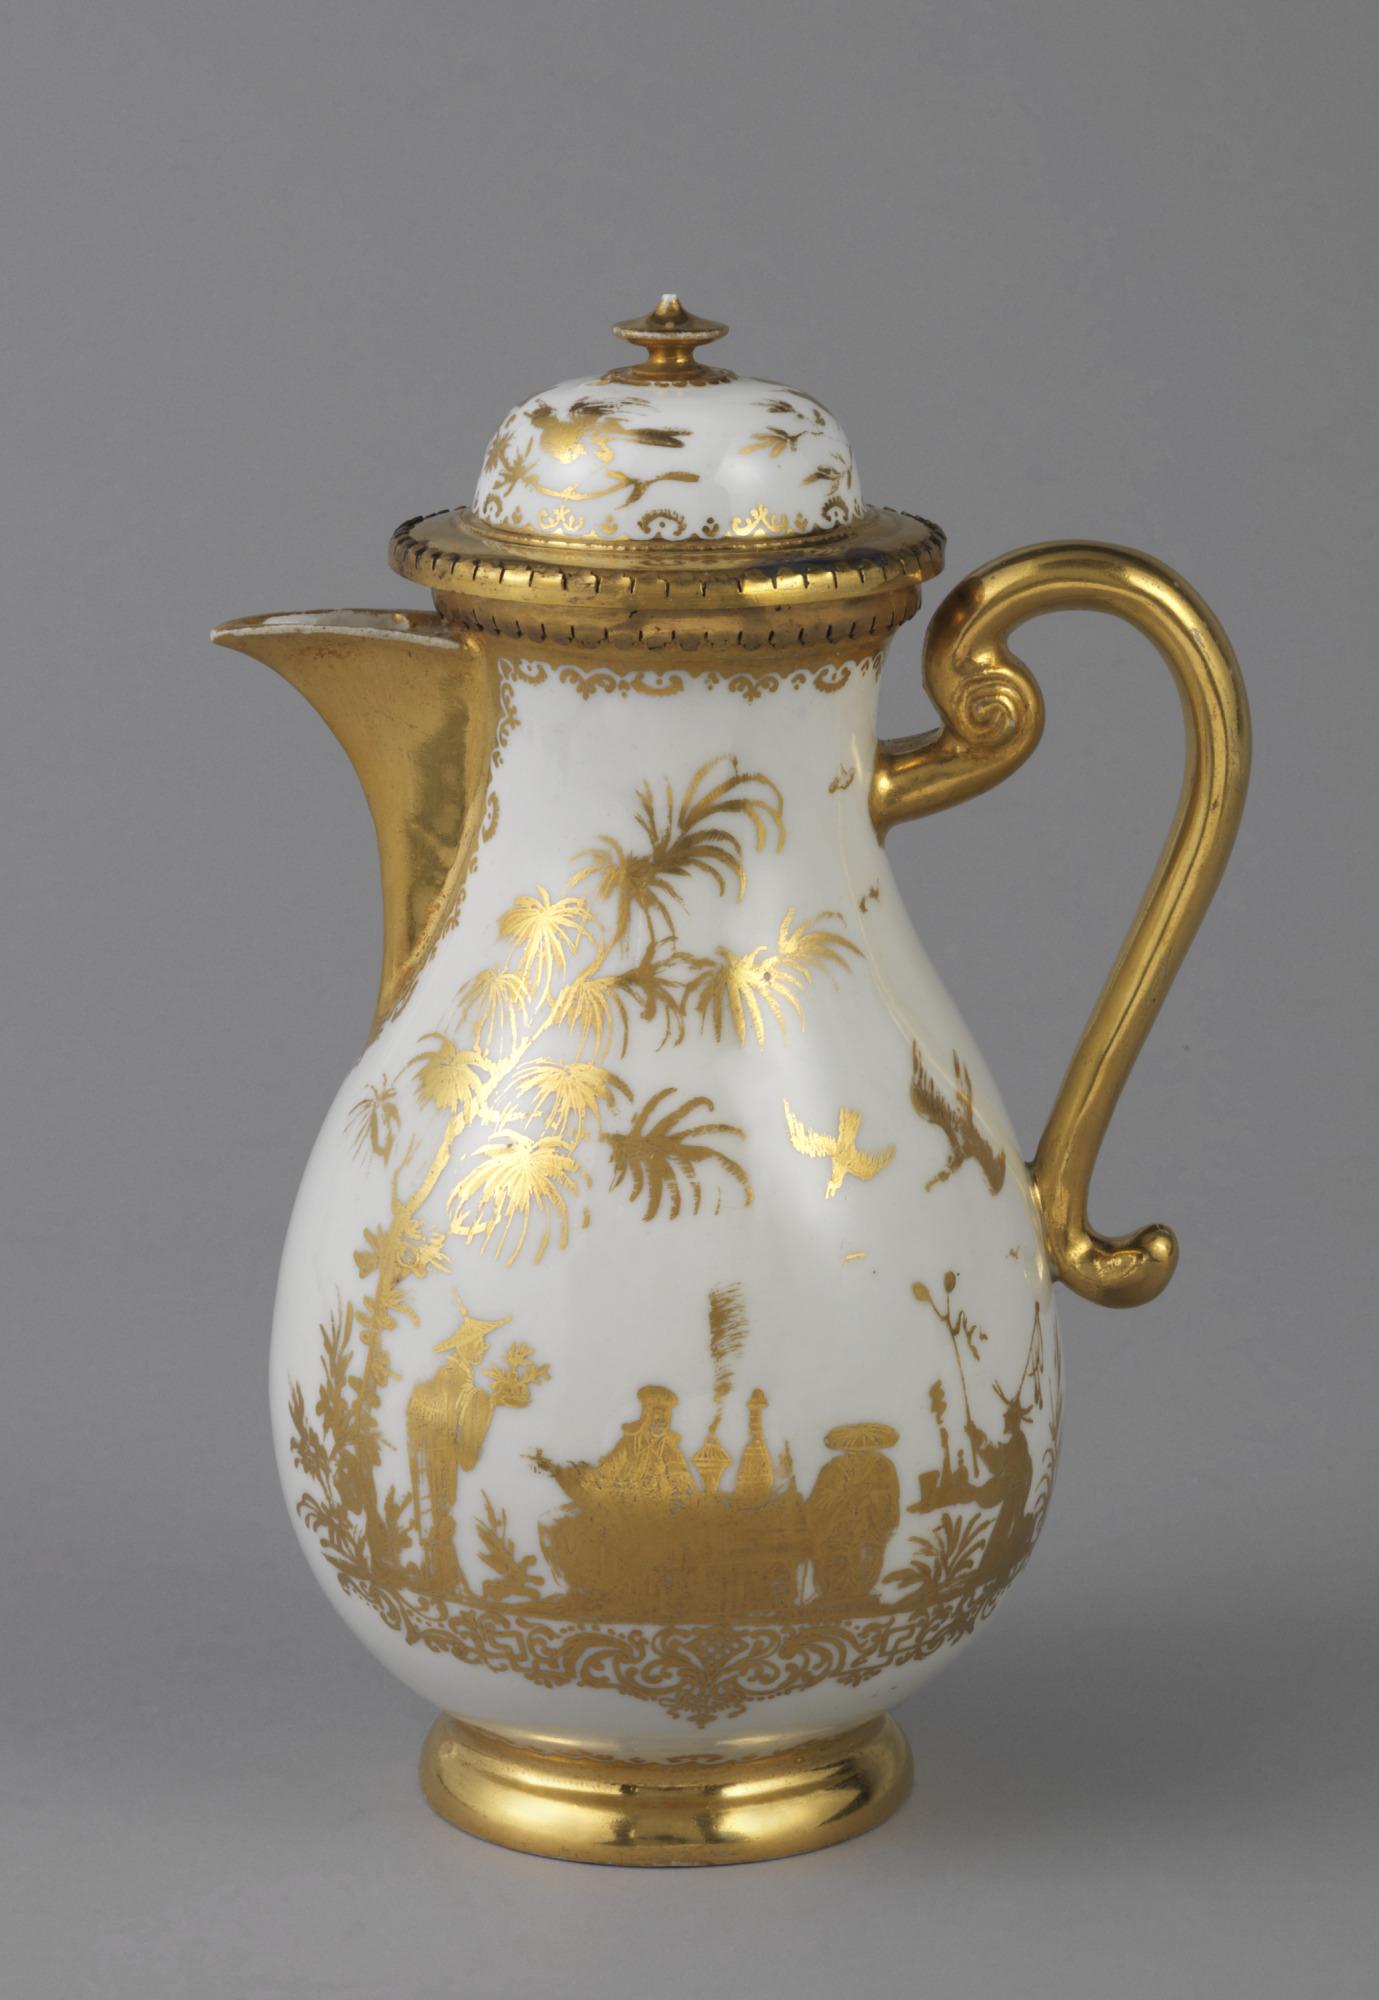 Coffeepot with 'Hausmaler' Decor